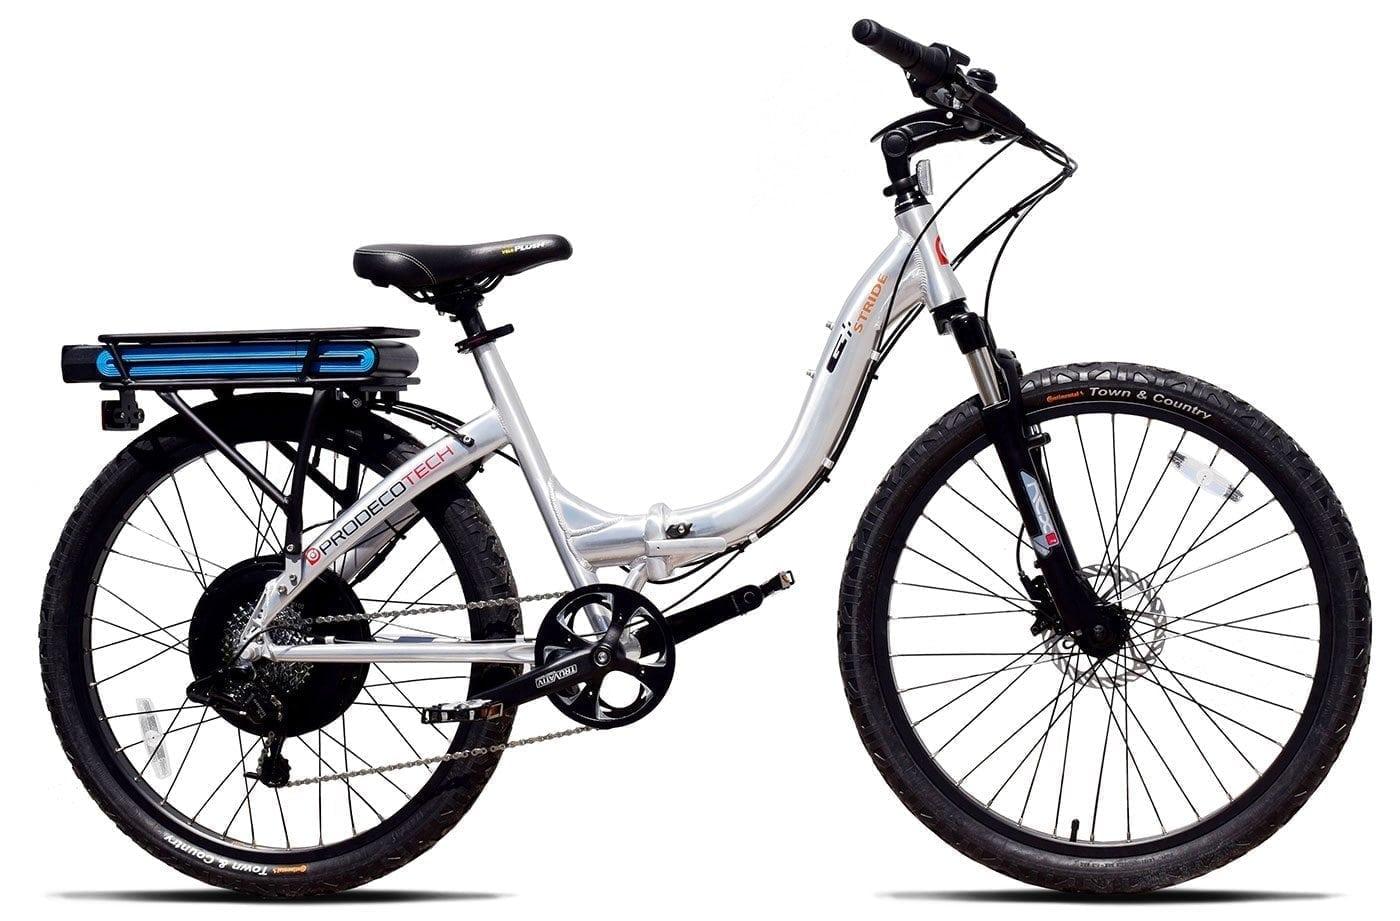 Versatile mountain bike blinker bicycle taillight Horn F1